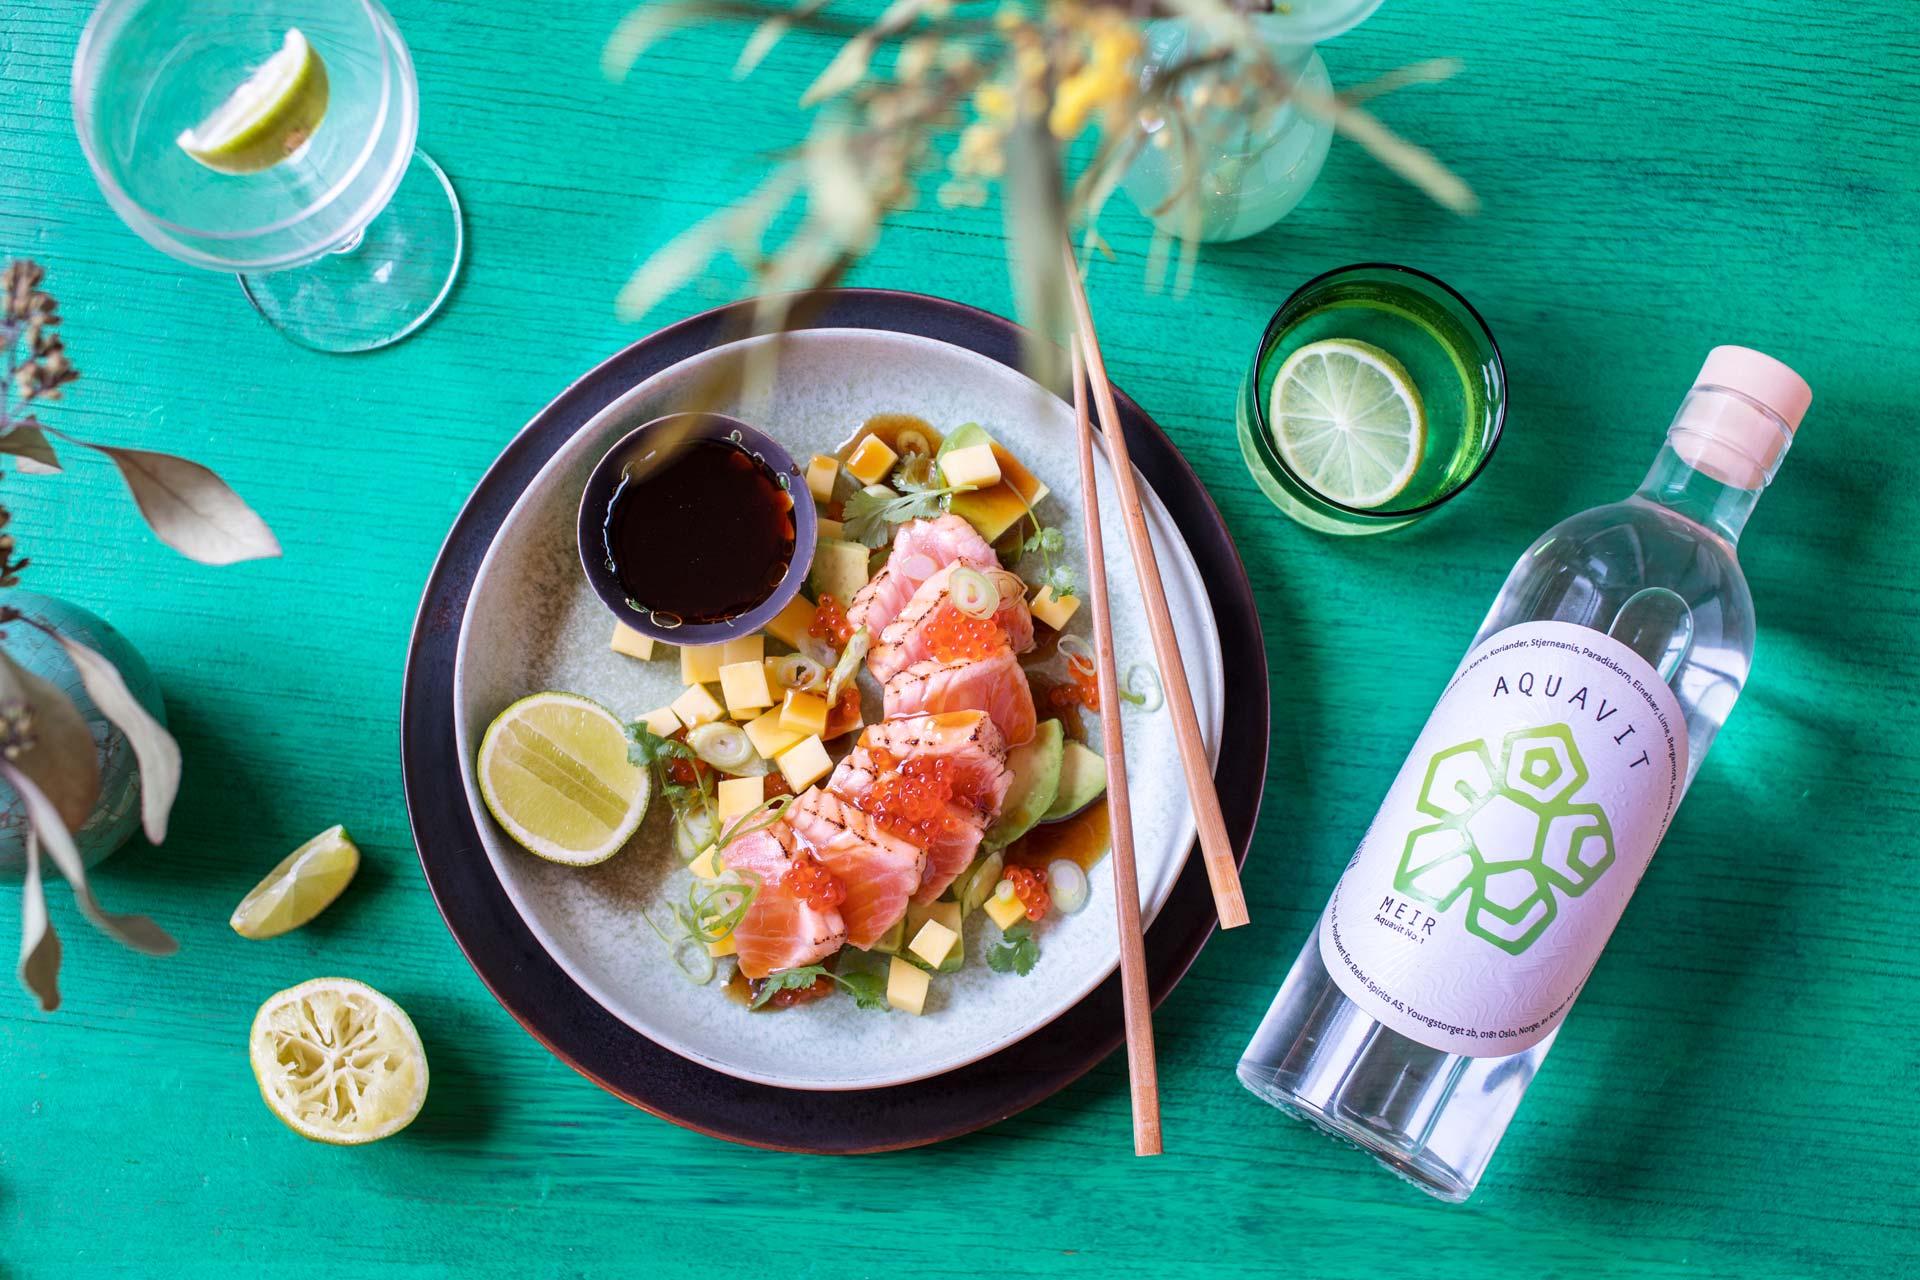 Salmon tataki with MEIR aquavit No. 1.